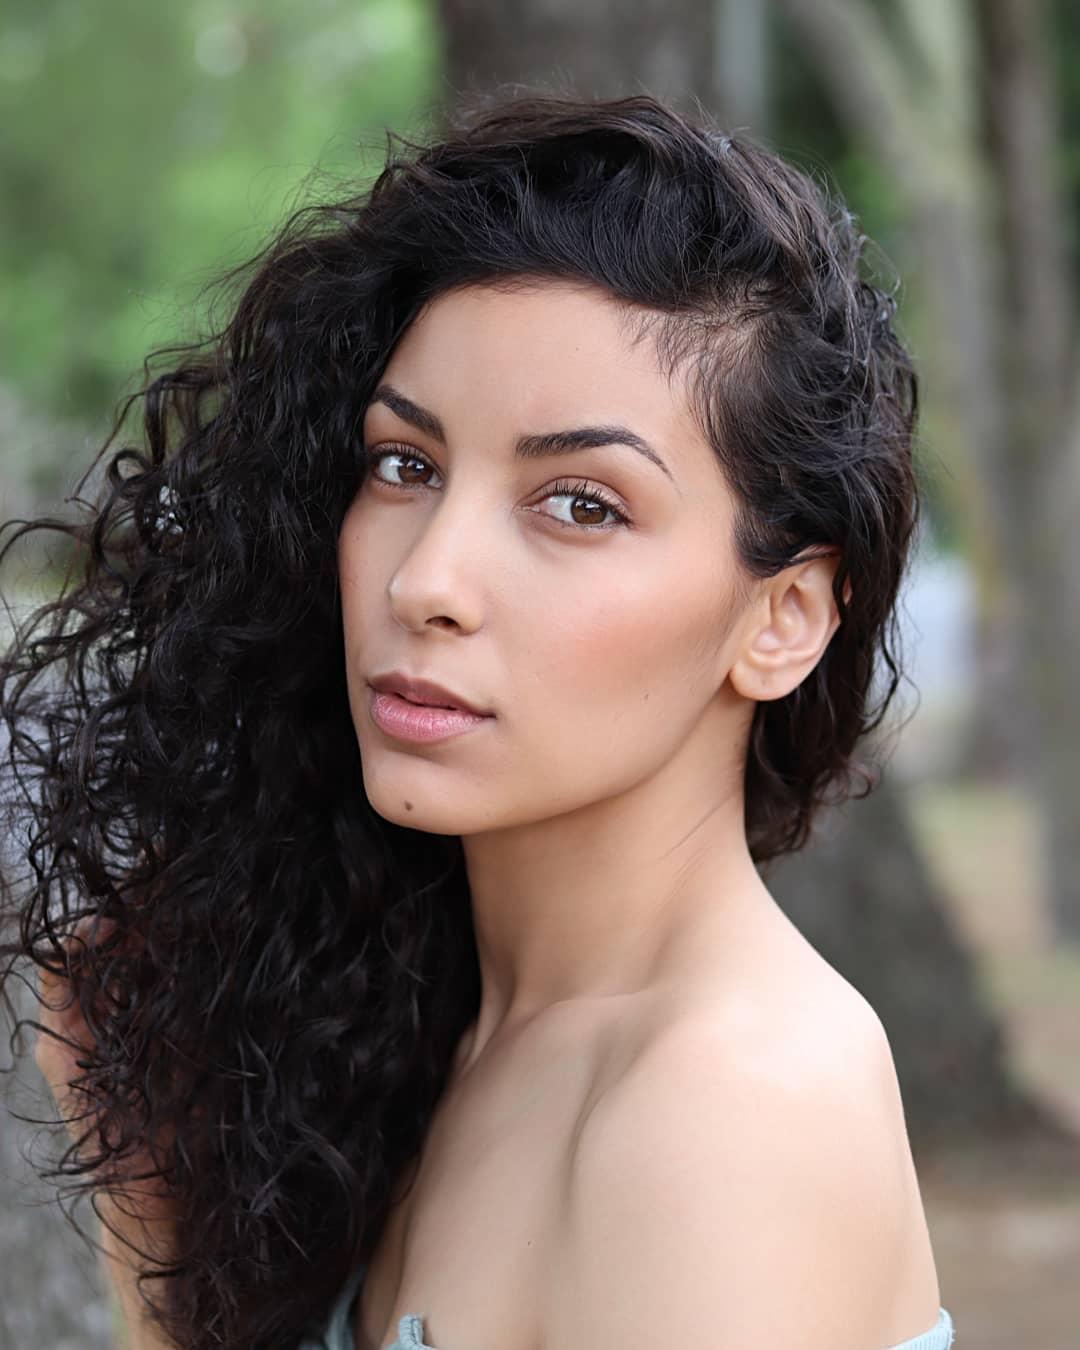 Mekaila Mathys as Tahira Kahn on Blood and Water